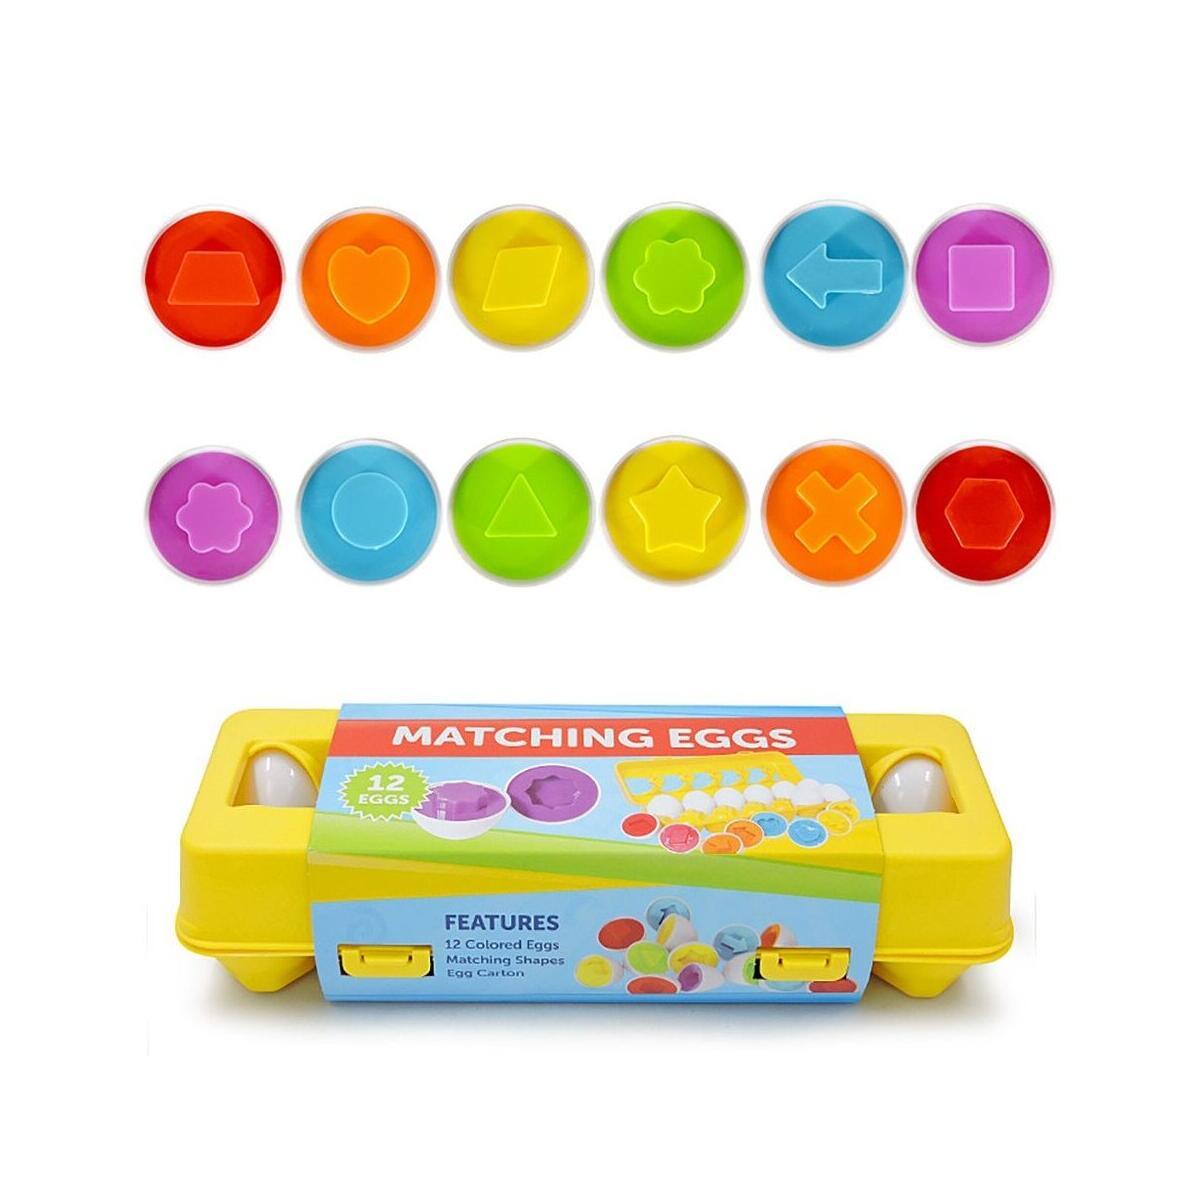 Toddler Color & Shape Sorter Matching Egg Set Educational Learning Toy Kids Gift